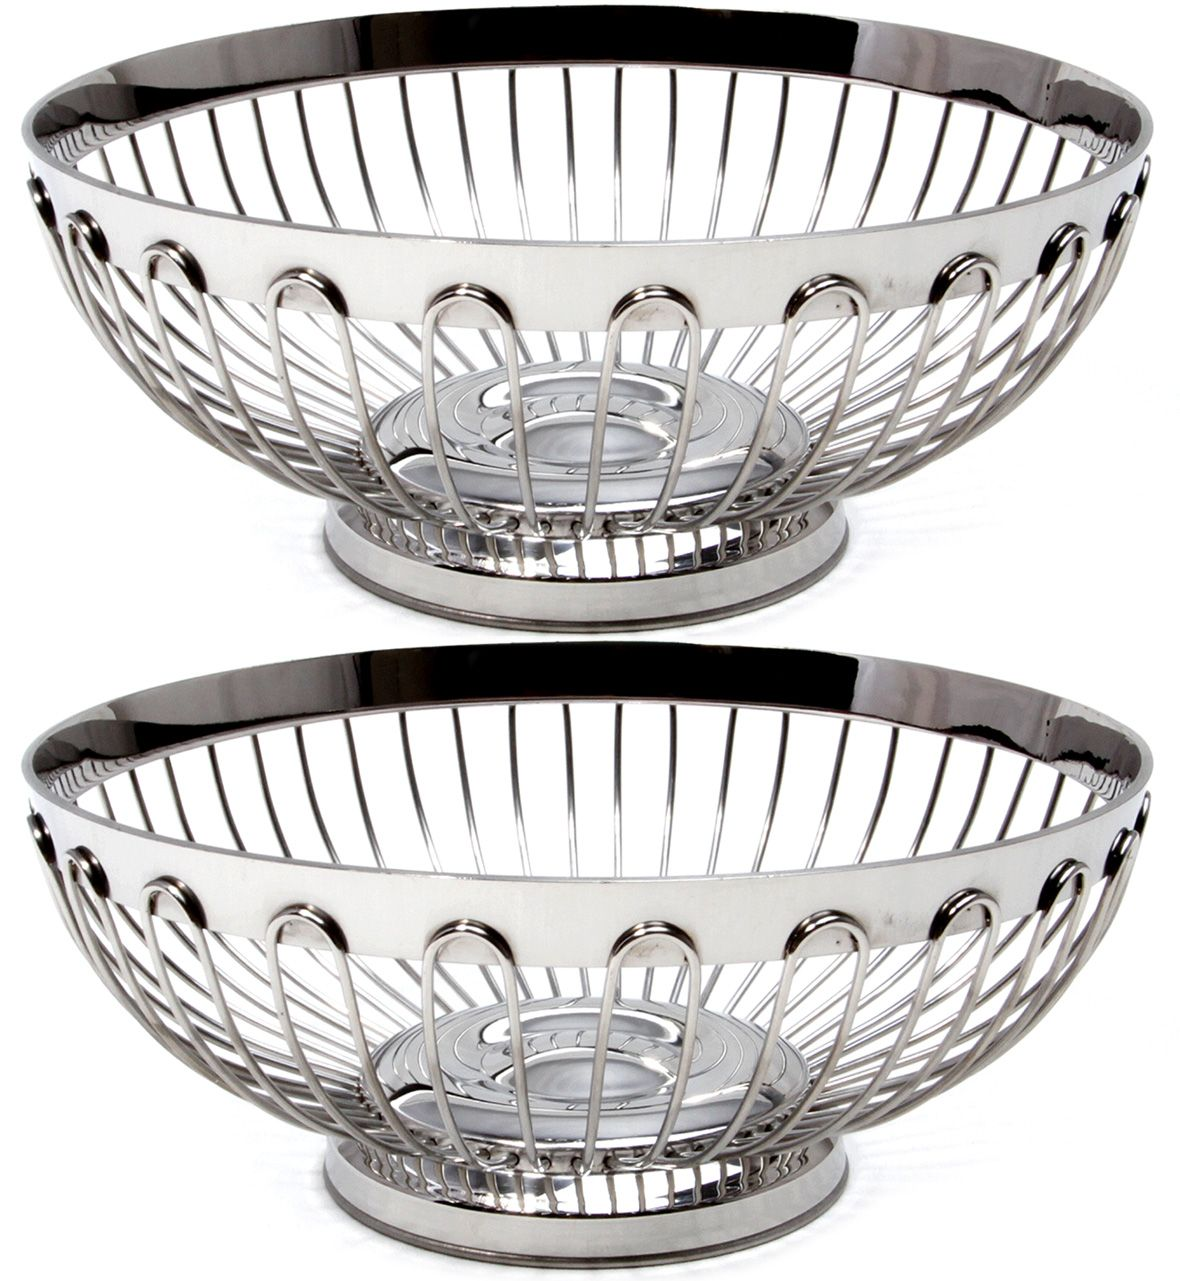 Maro Megastore Stainless Steel Fruit Bowl Basket Stand Holder Wire